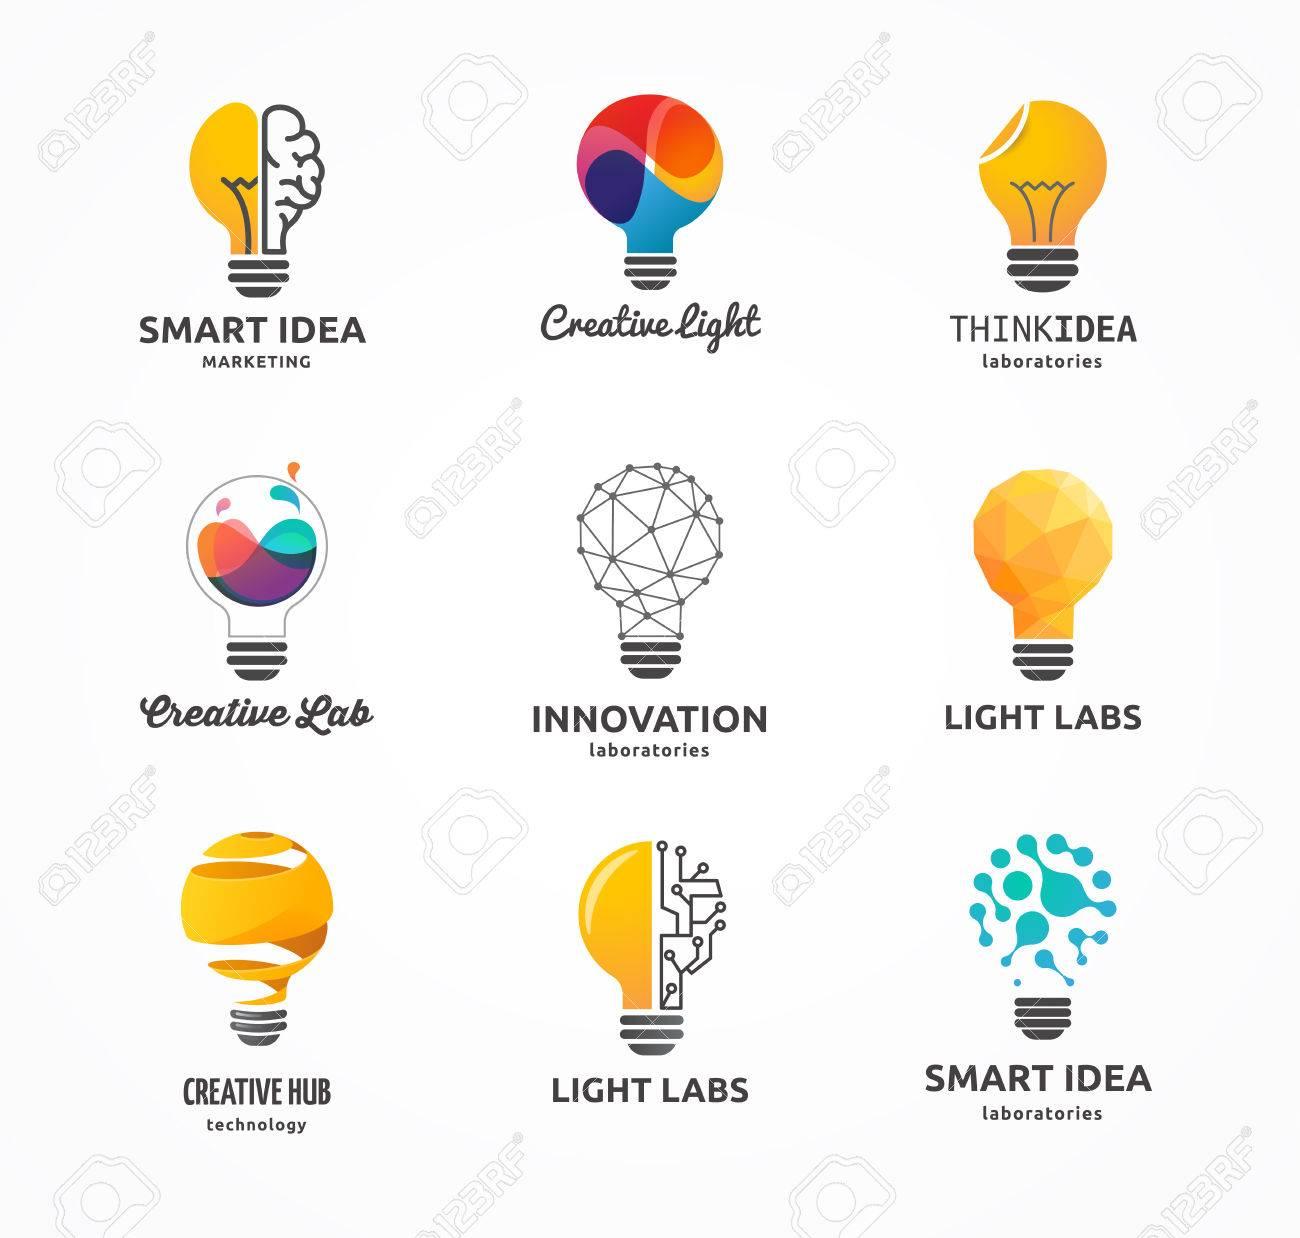 Light bulb - idea, creative, technology icons and elements - 52823561